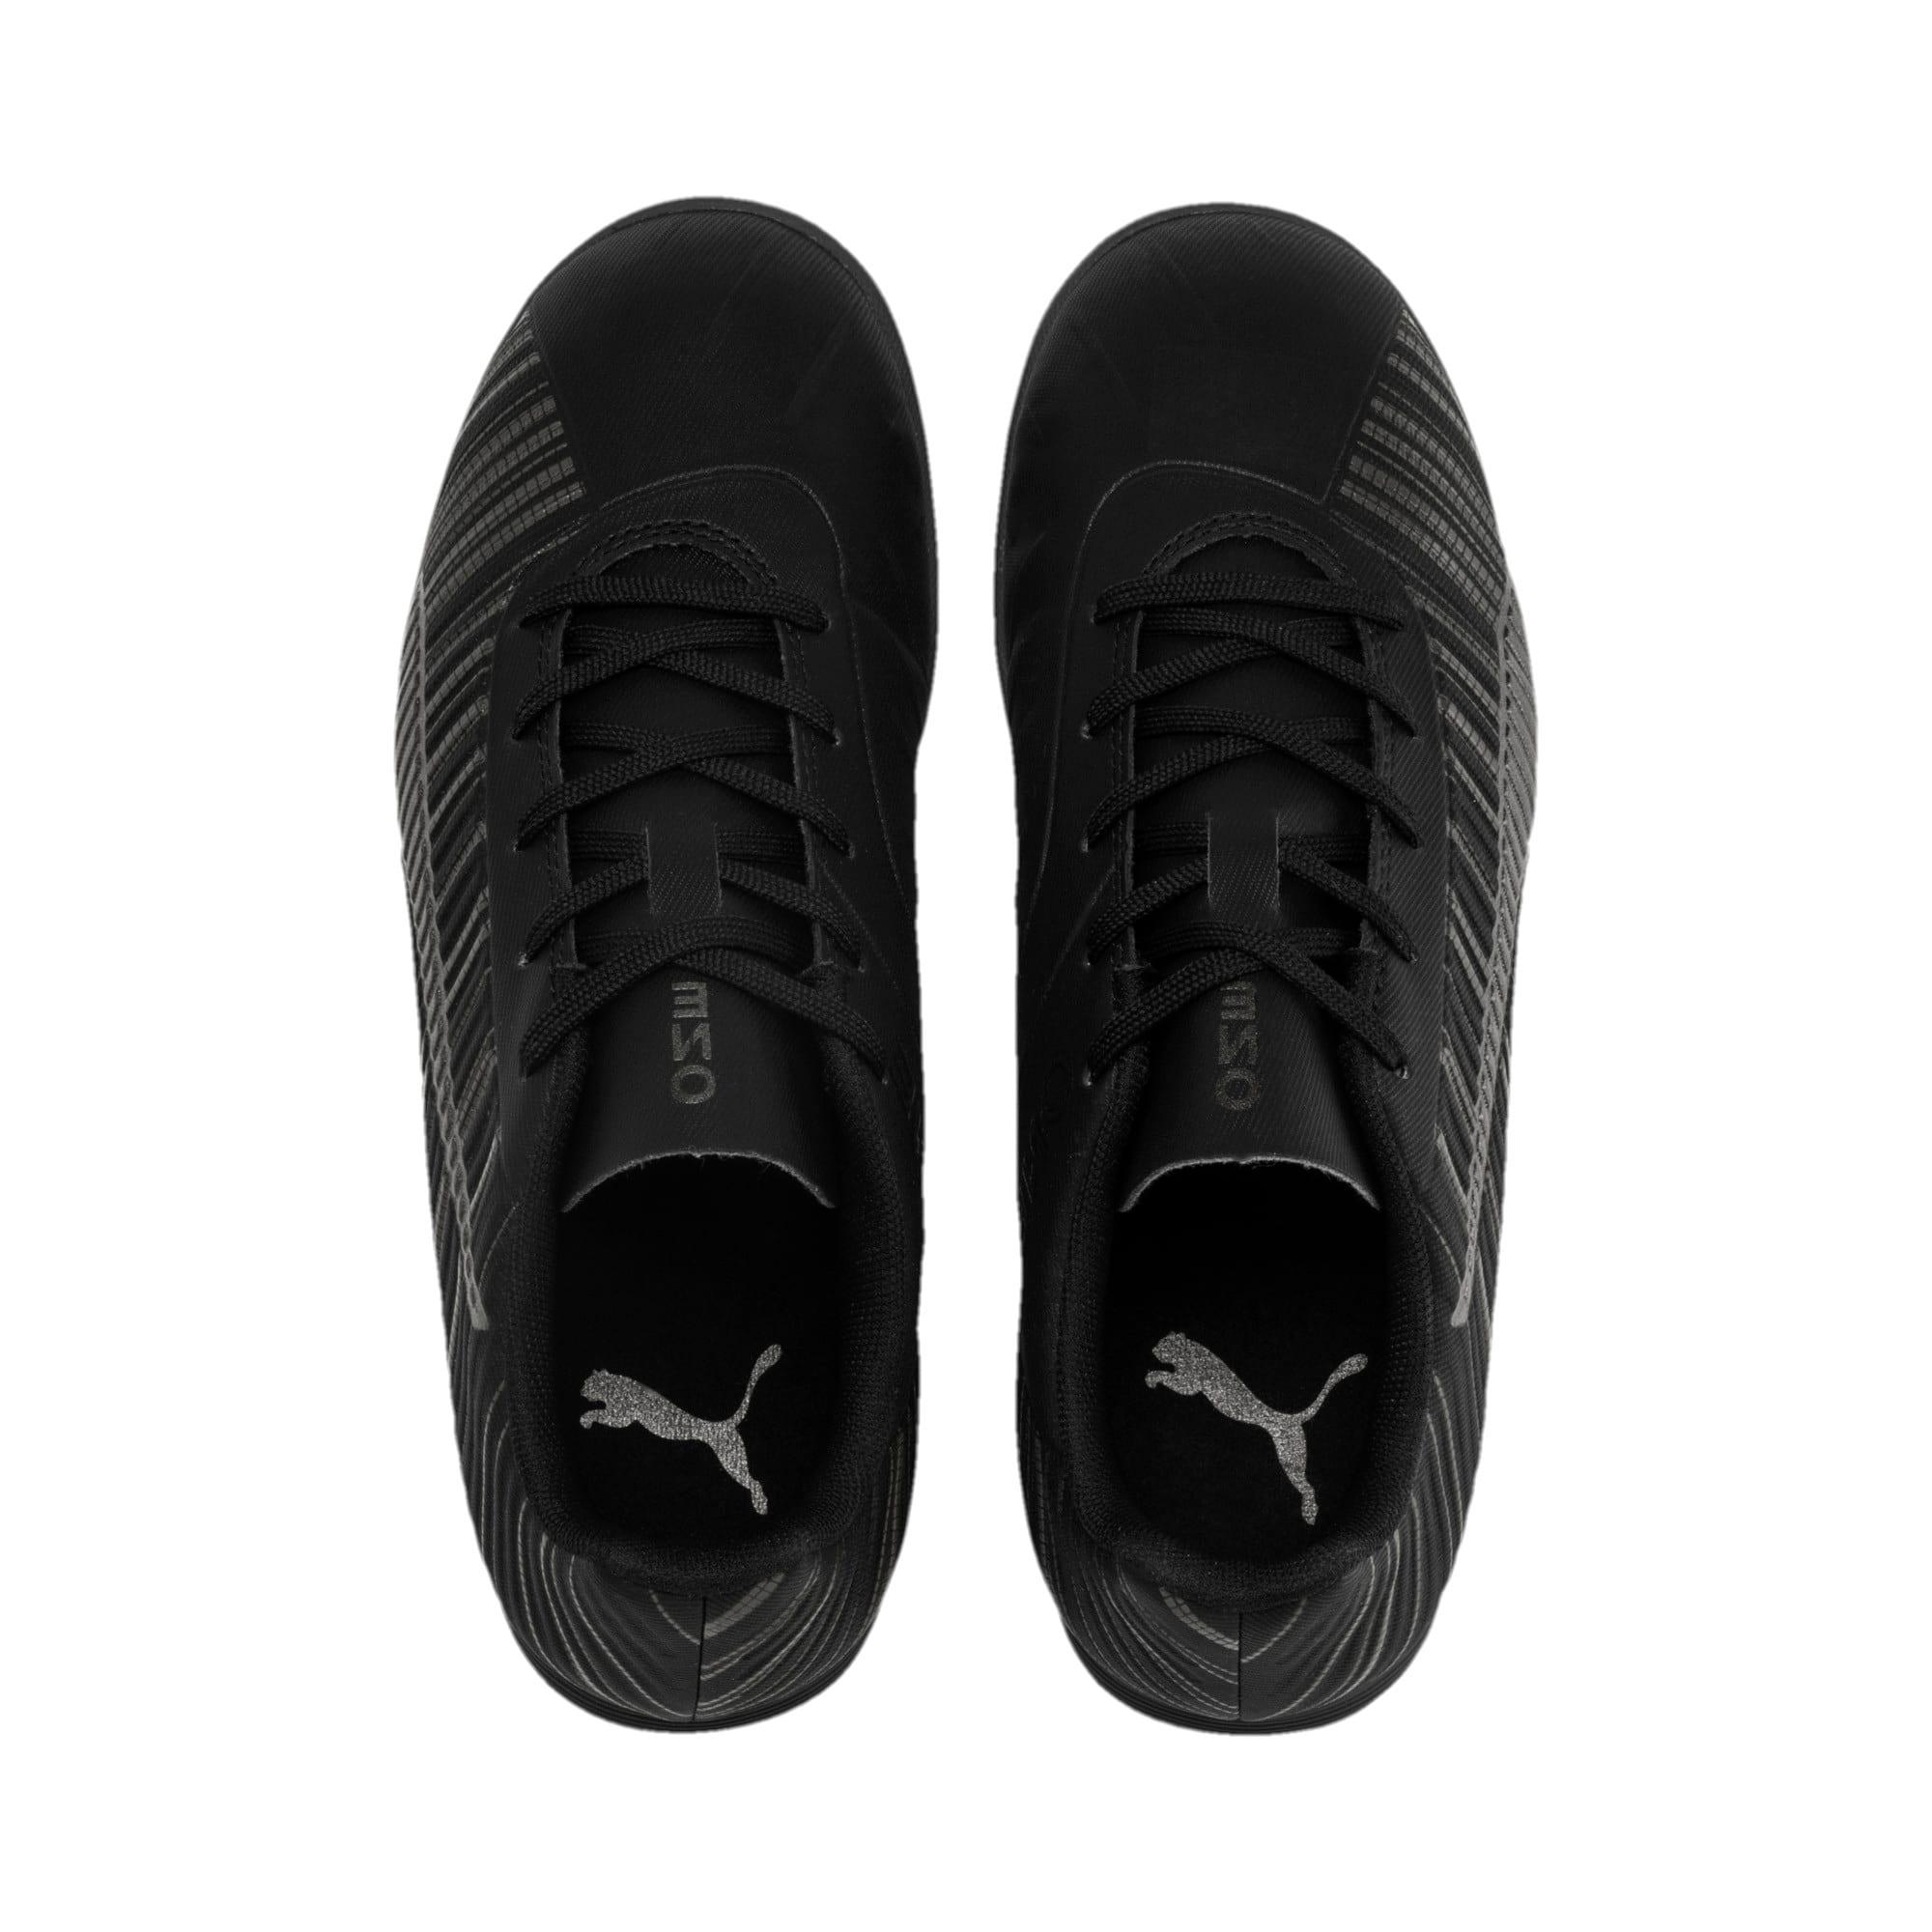 Thumbnail 6 of PUMA ONE 5.4 TT Soccer Shoes JR, Black-Black-Puma Aged Silver, medium